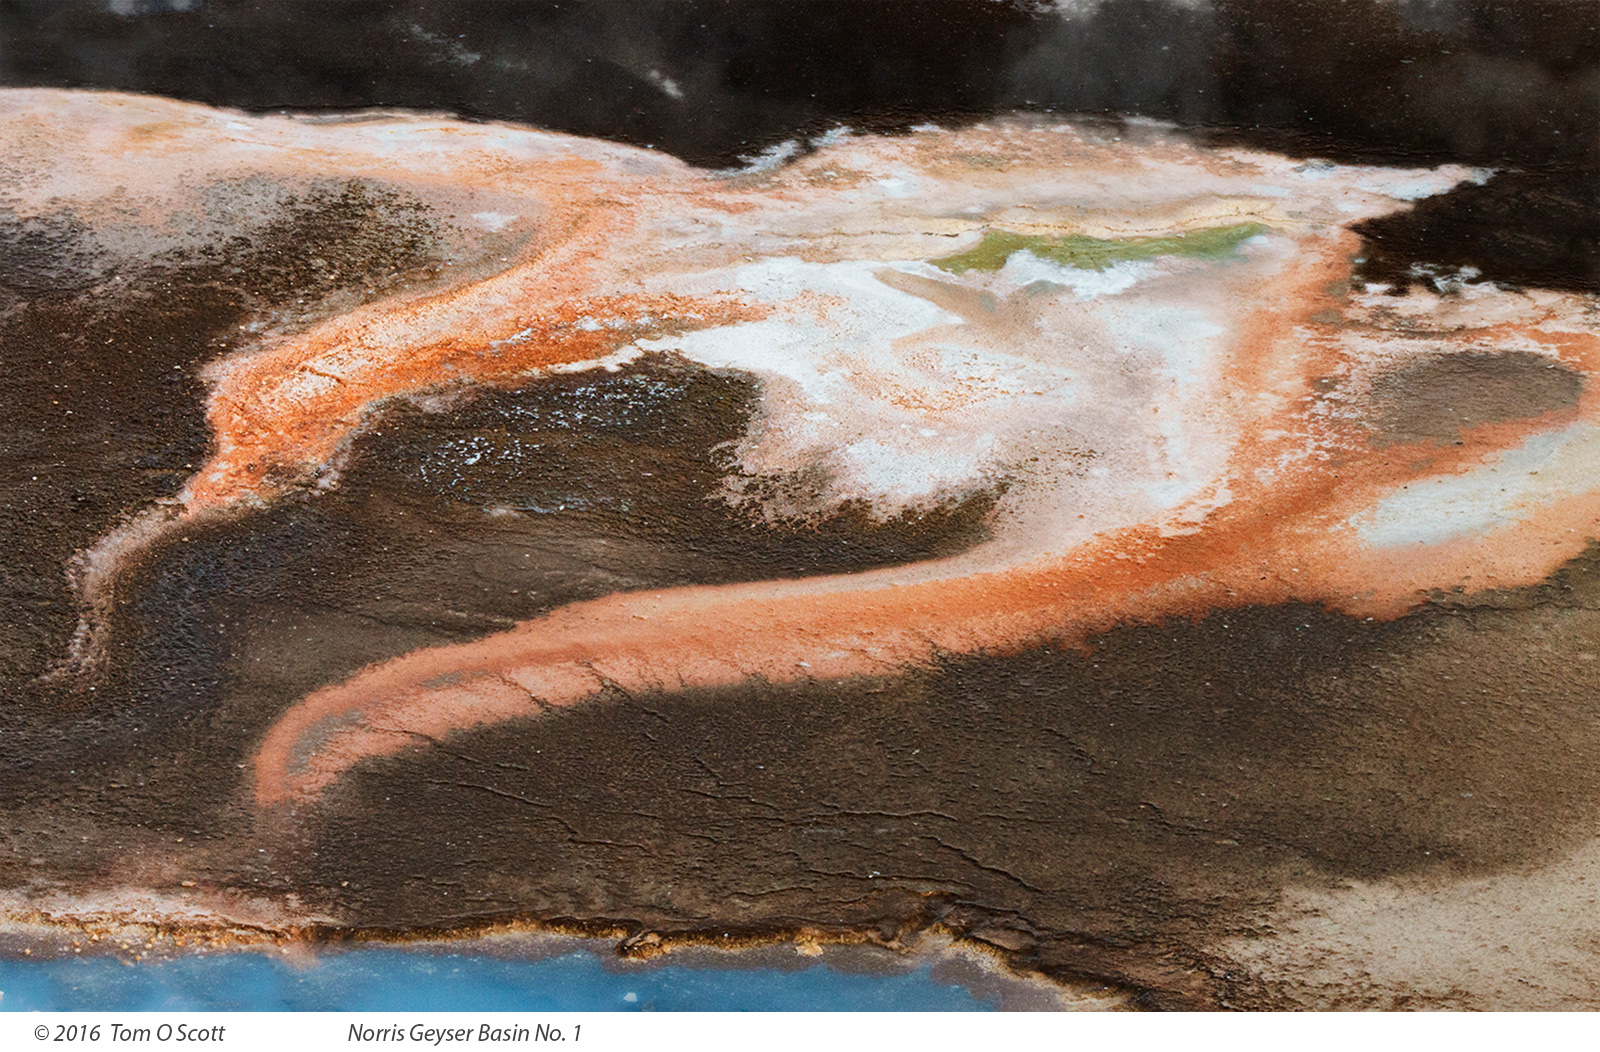 Norris Geyser Basin No. 1